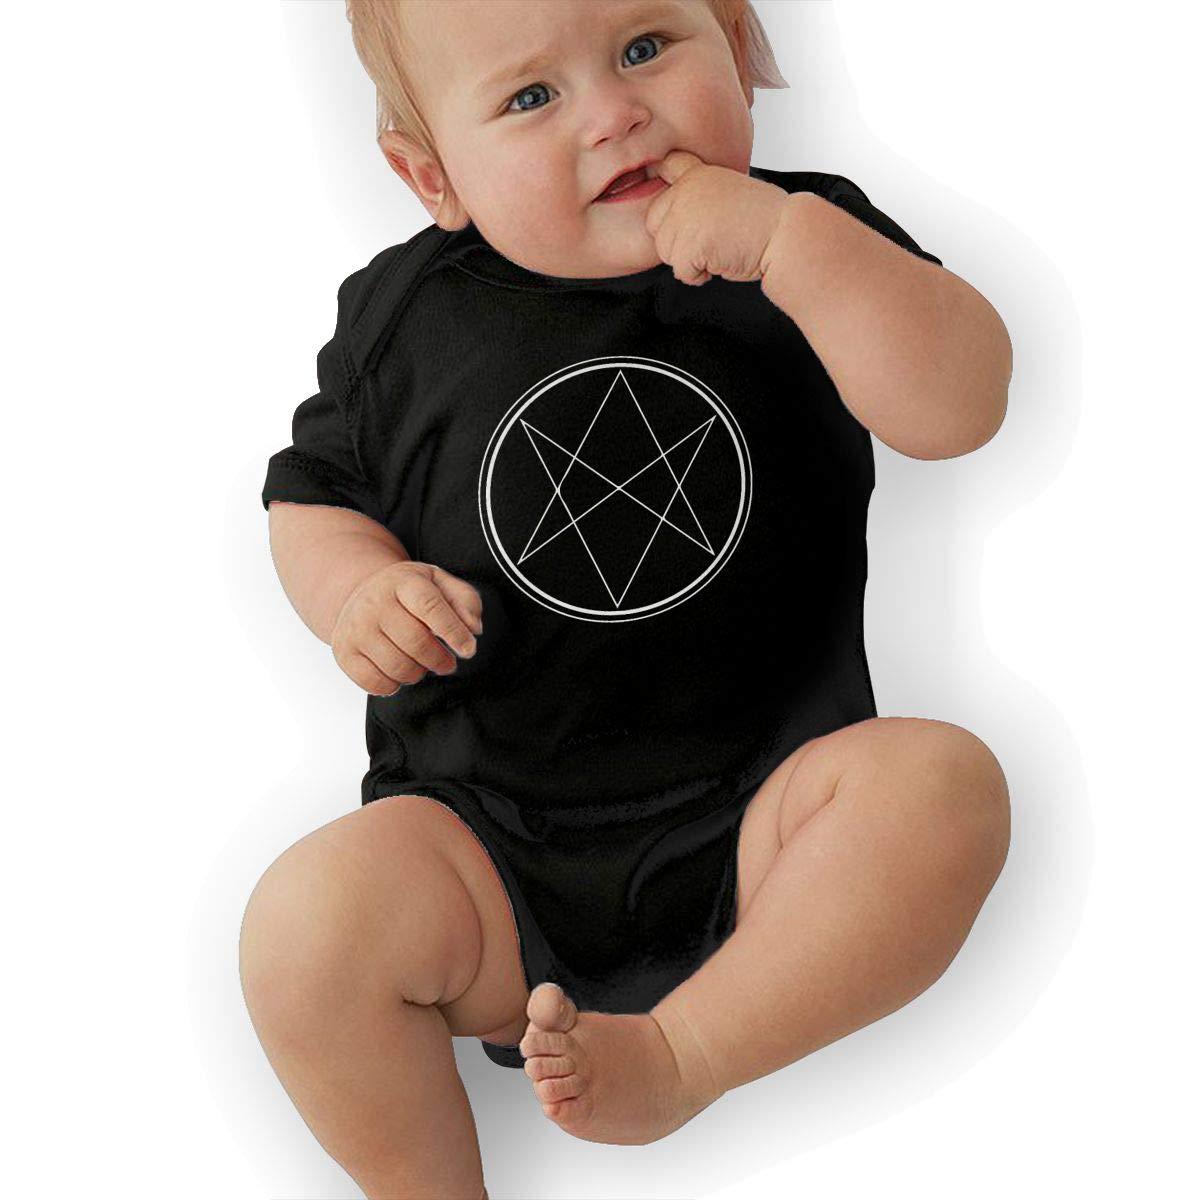 Mri-le2 Baby Boy Short Sleeve Jersey Bodysuit Supernatural Baby Clothes